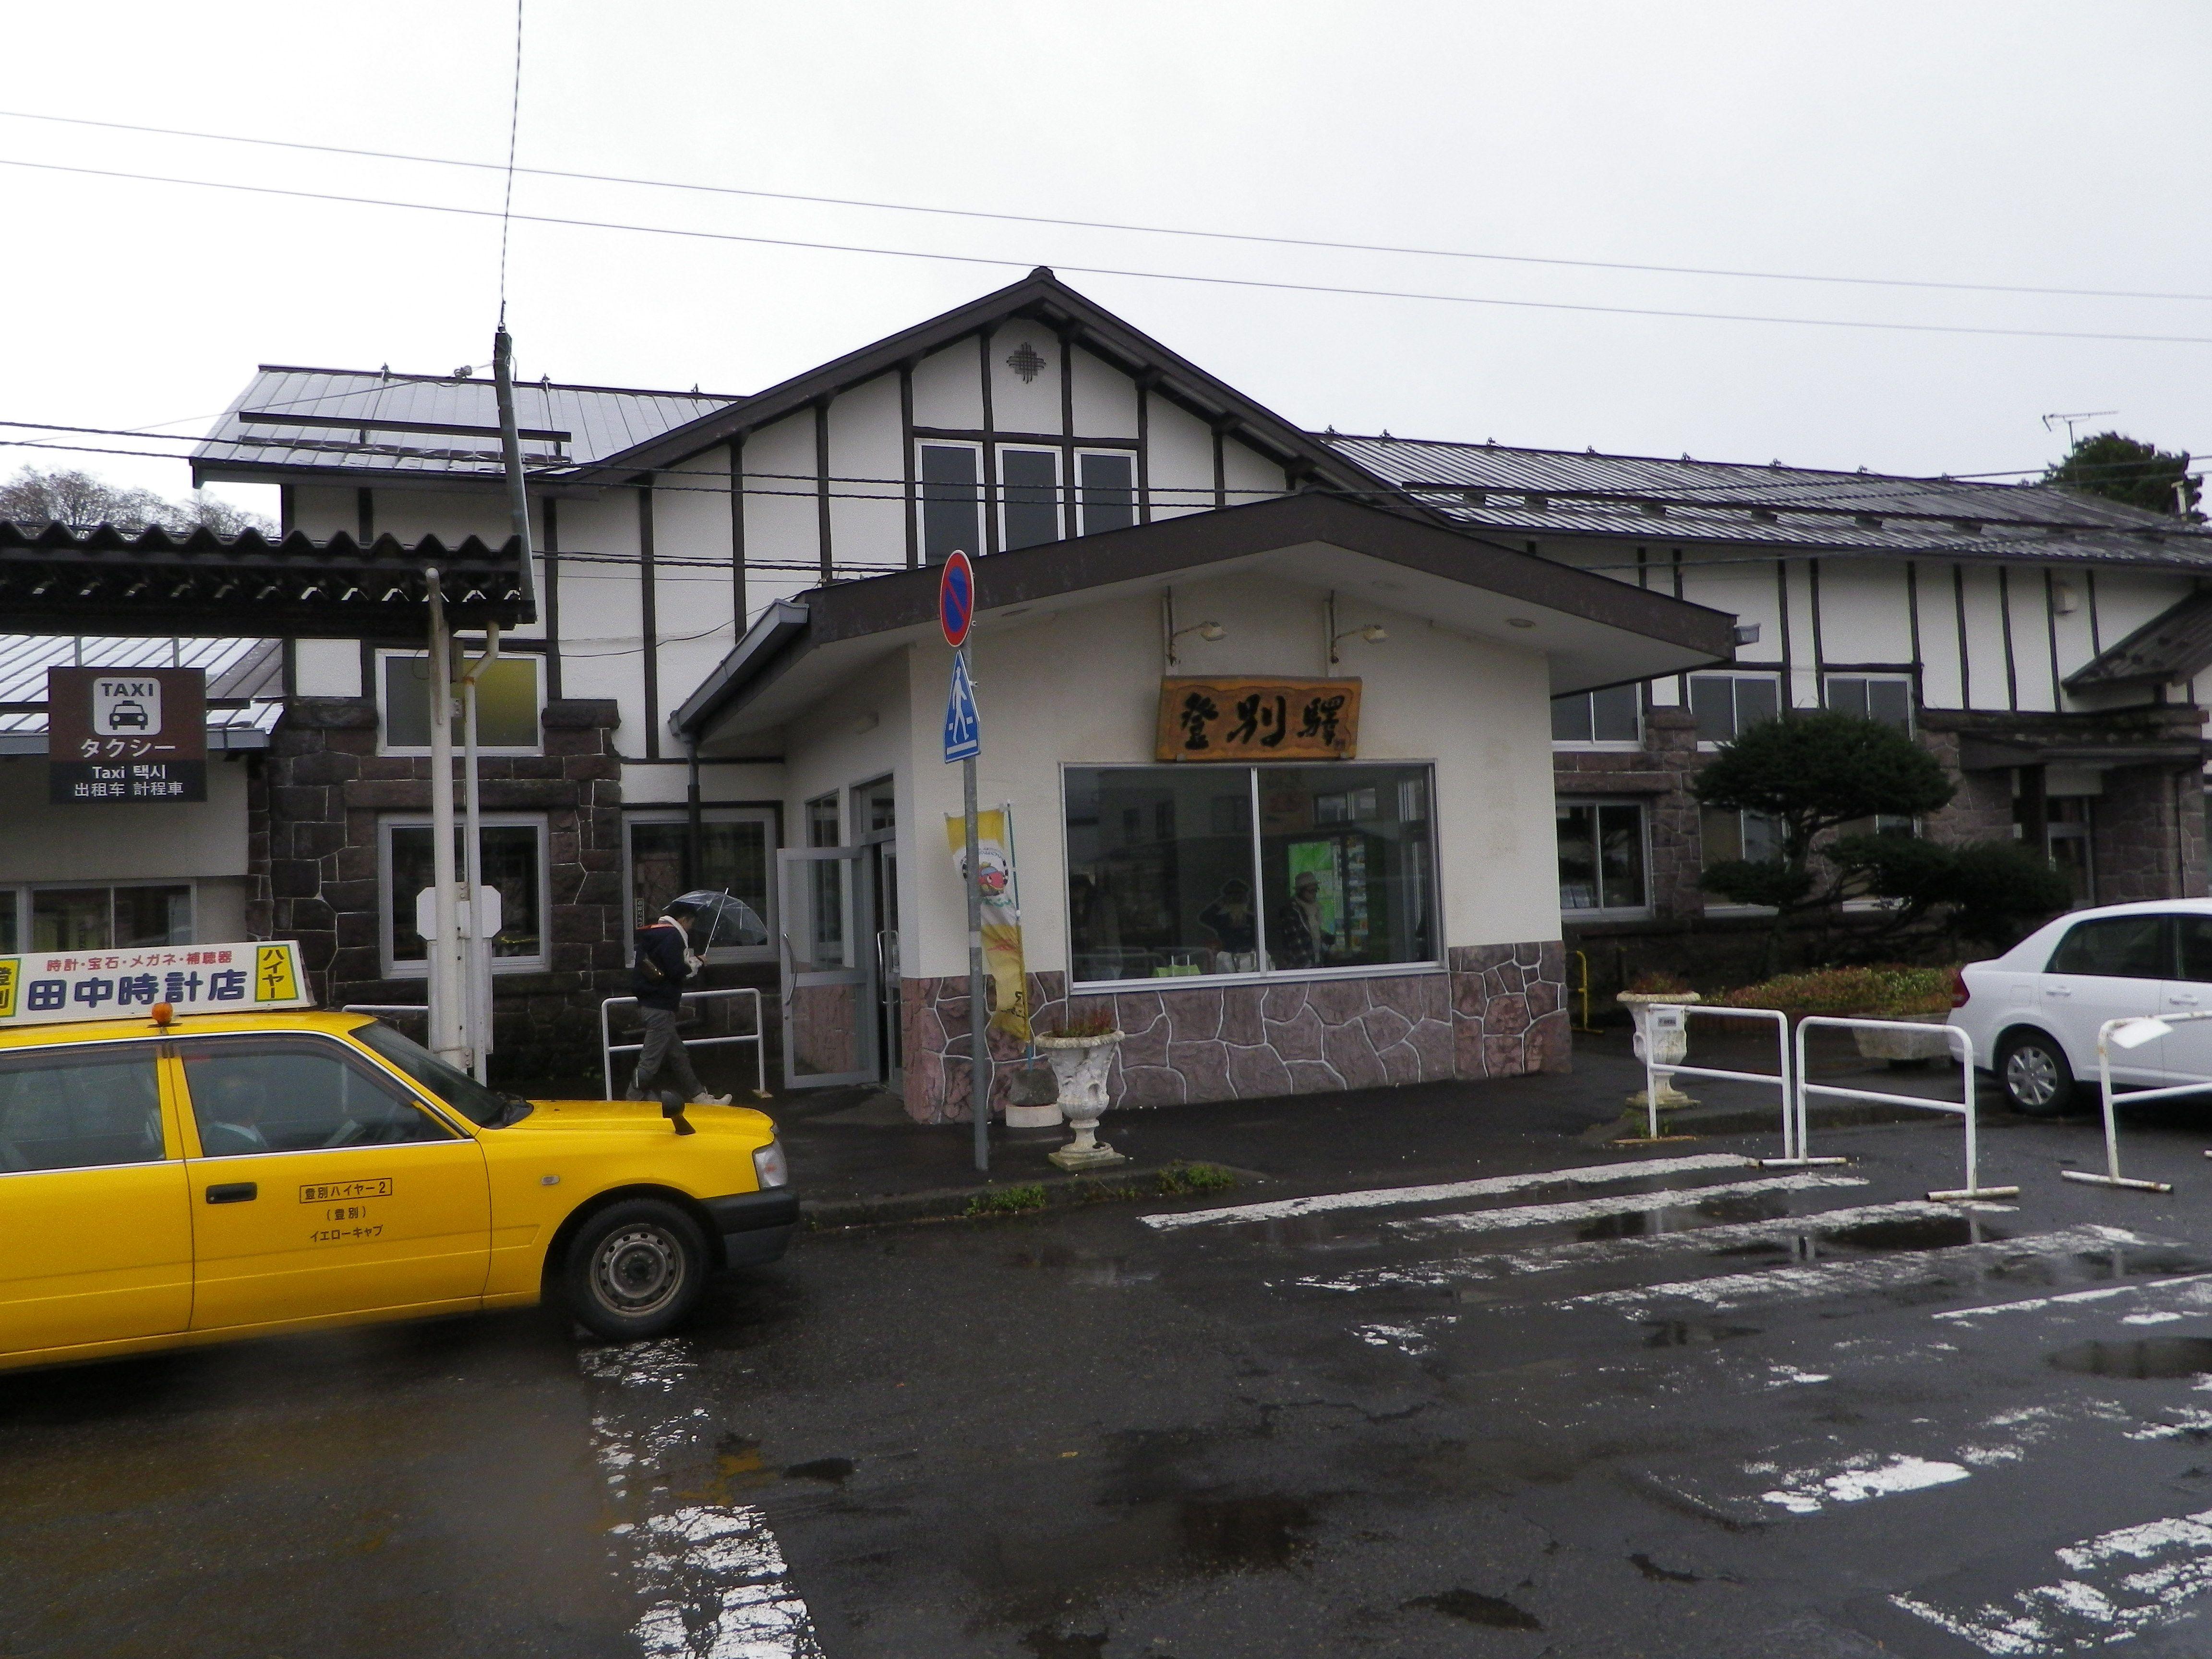 Noboribetsu Station 登別駅 画像あり 登別 駅 北海道